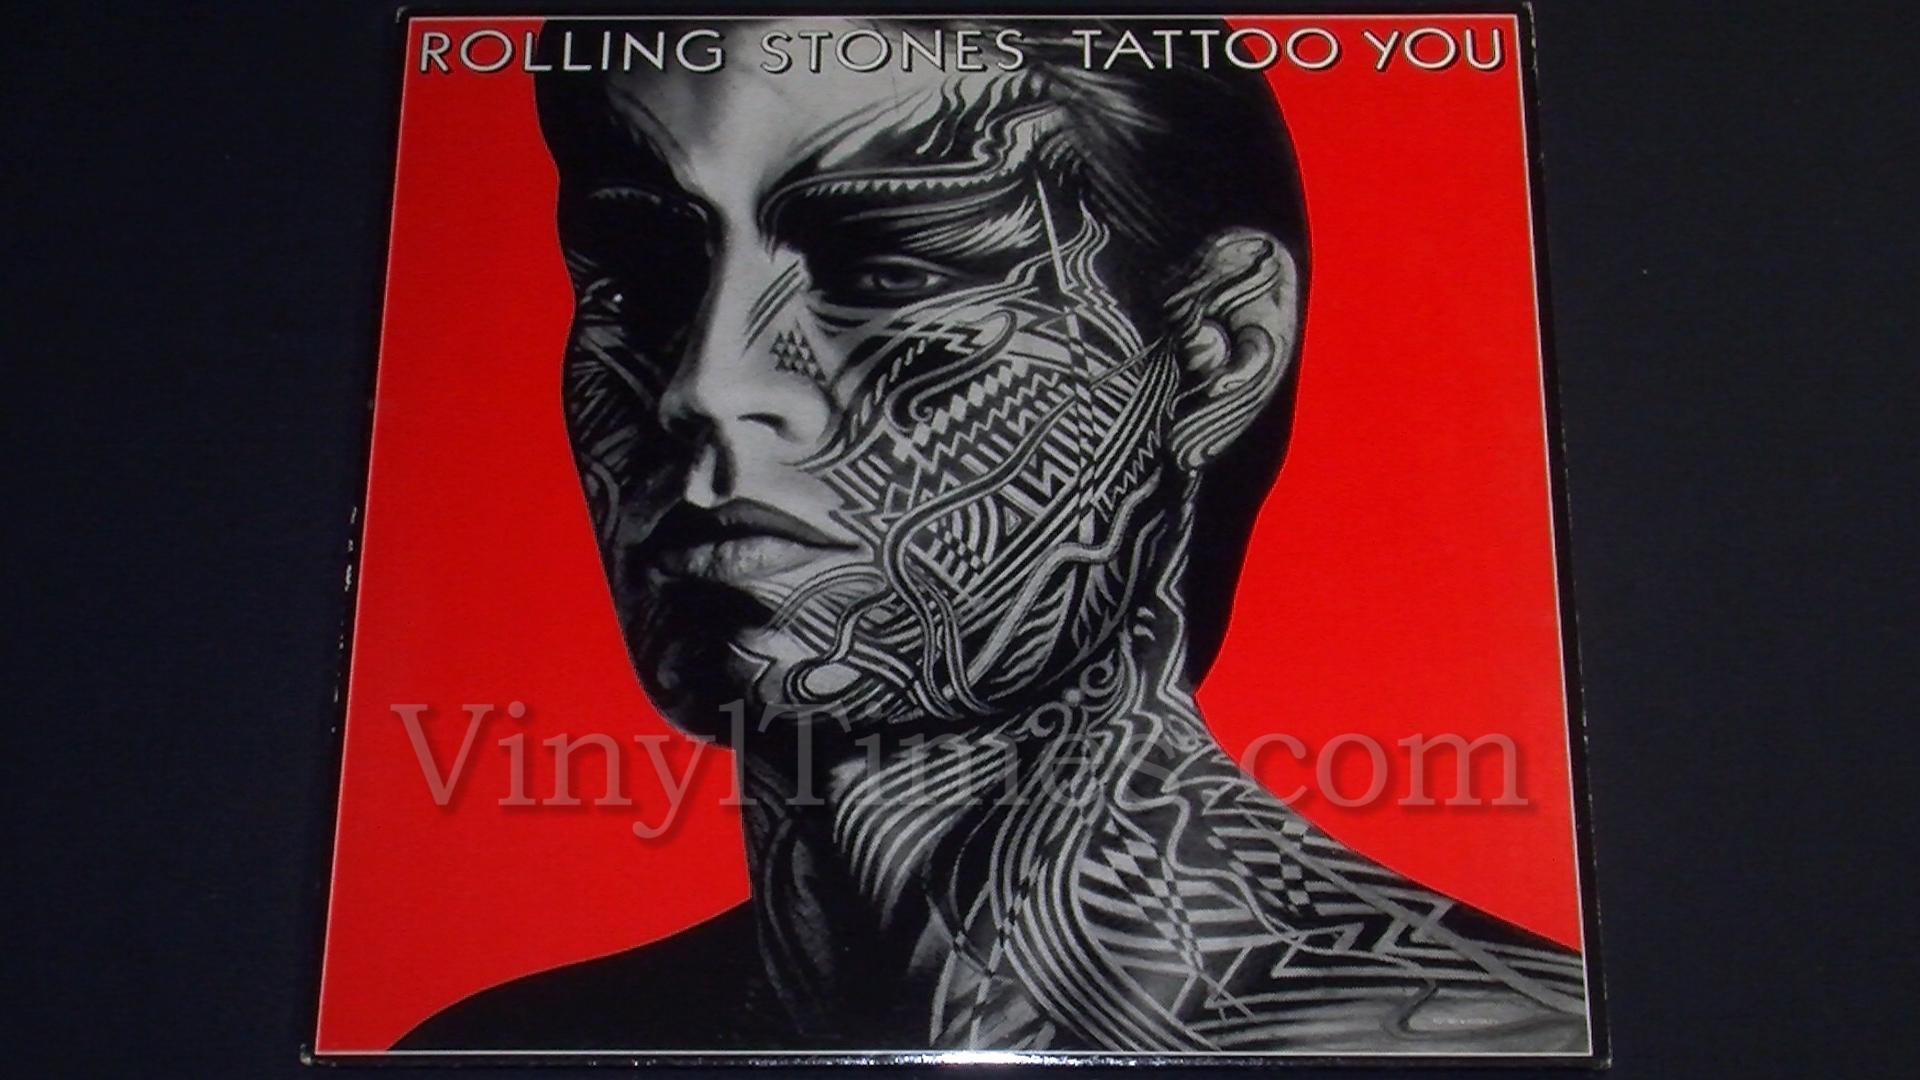 Rolling Stones Quot Tattoo You Quot Vinyl Lp Vinyltimesvinyltimes